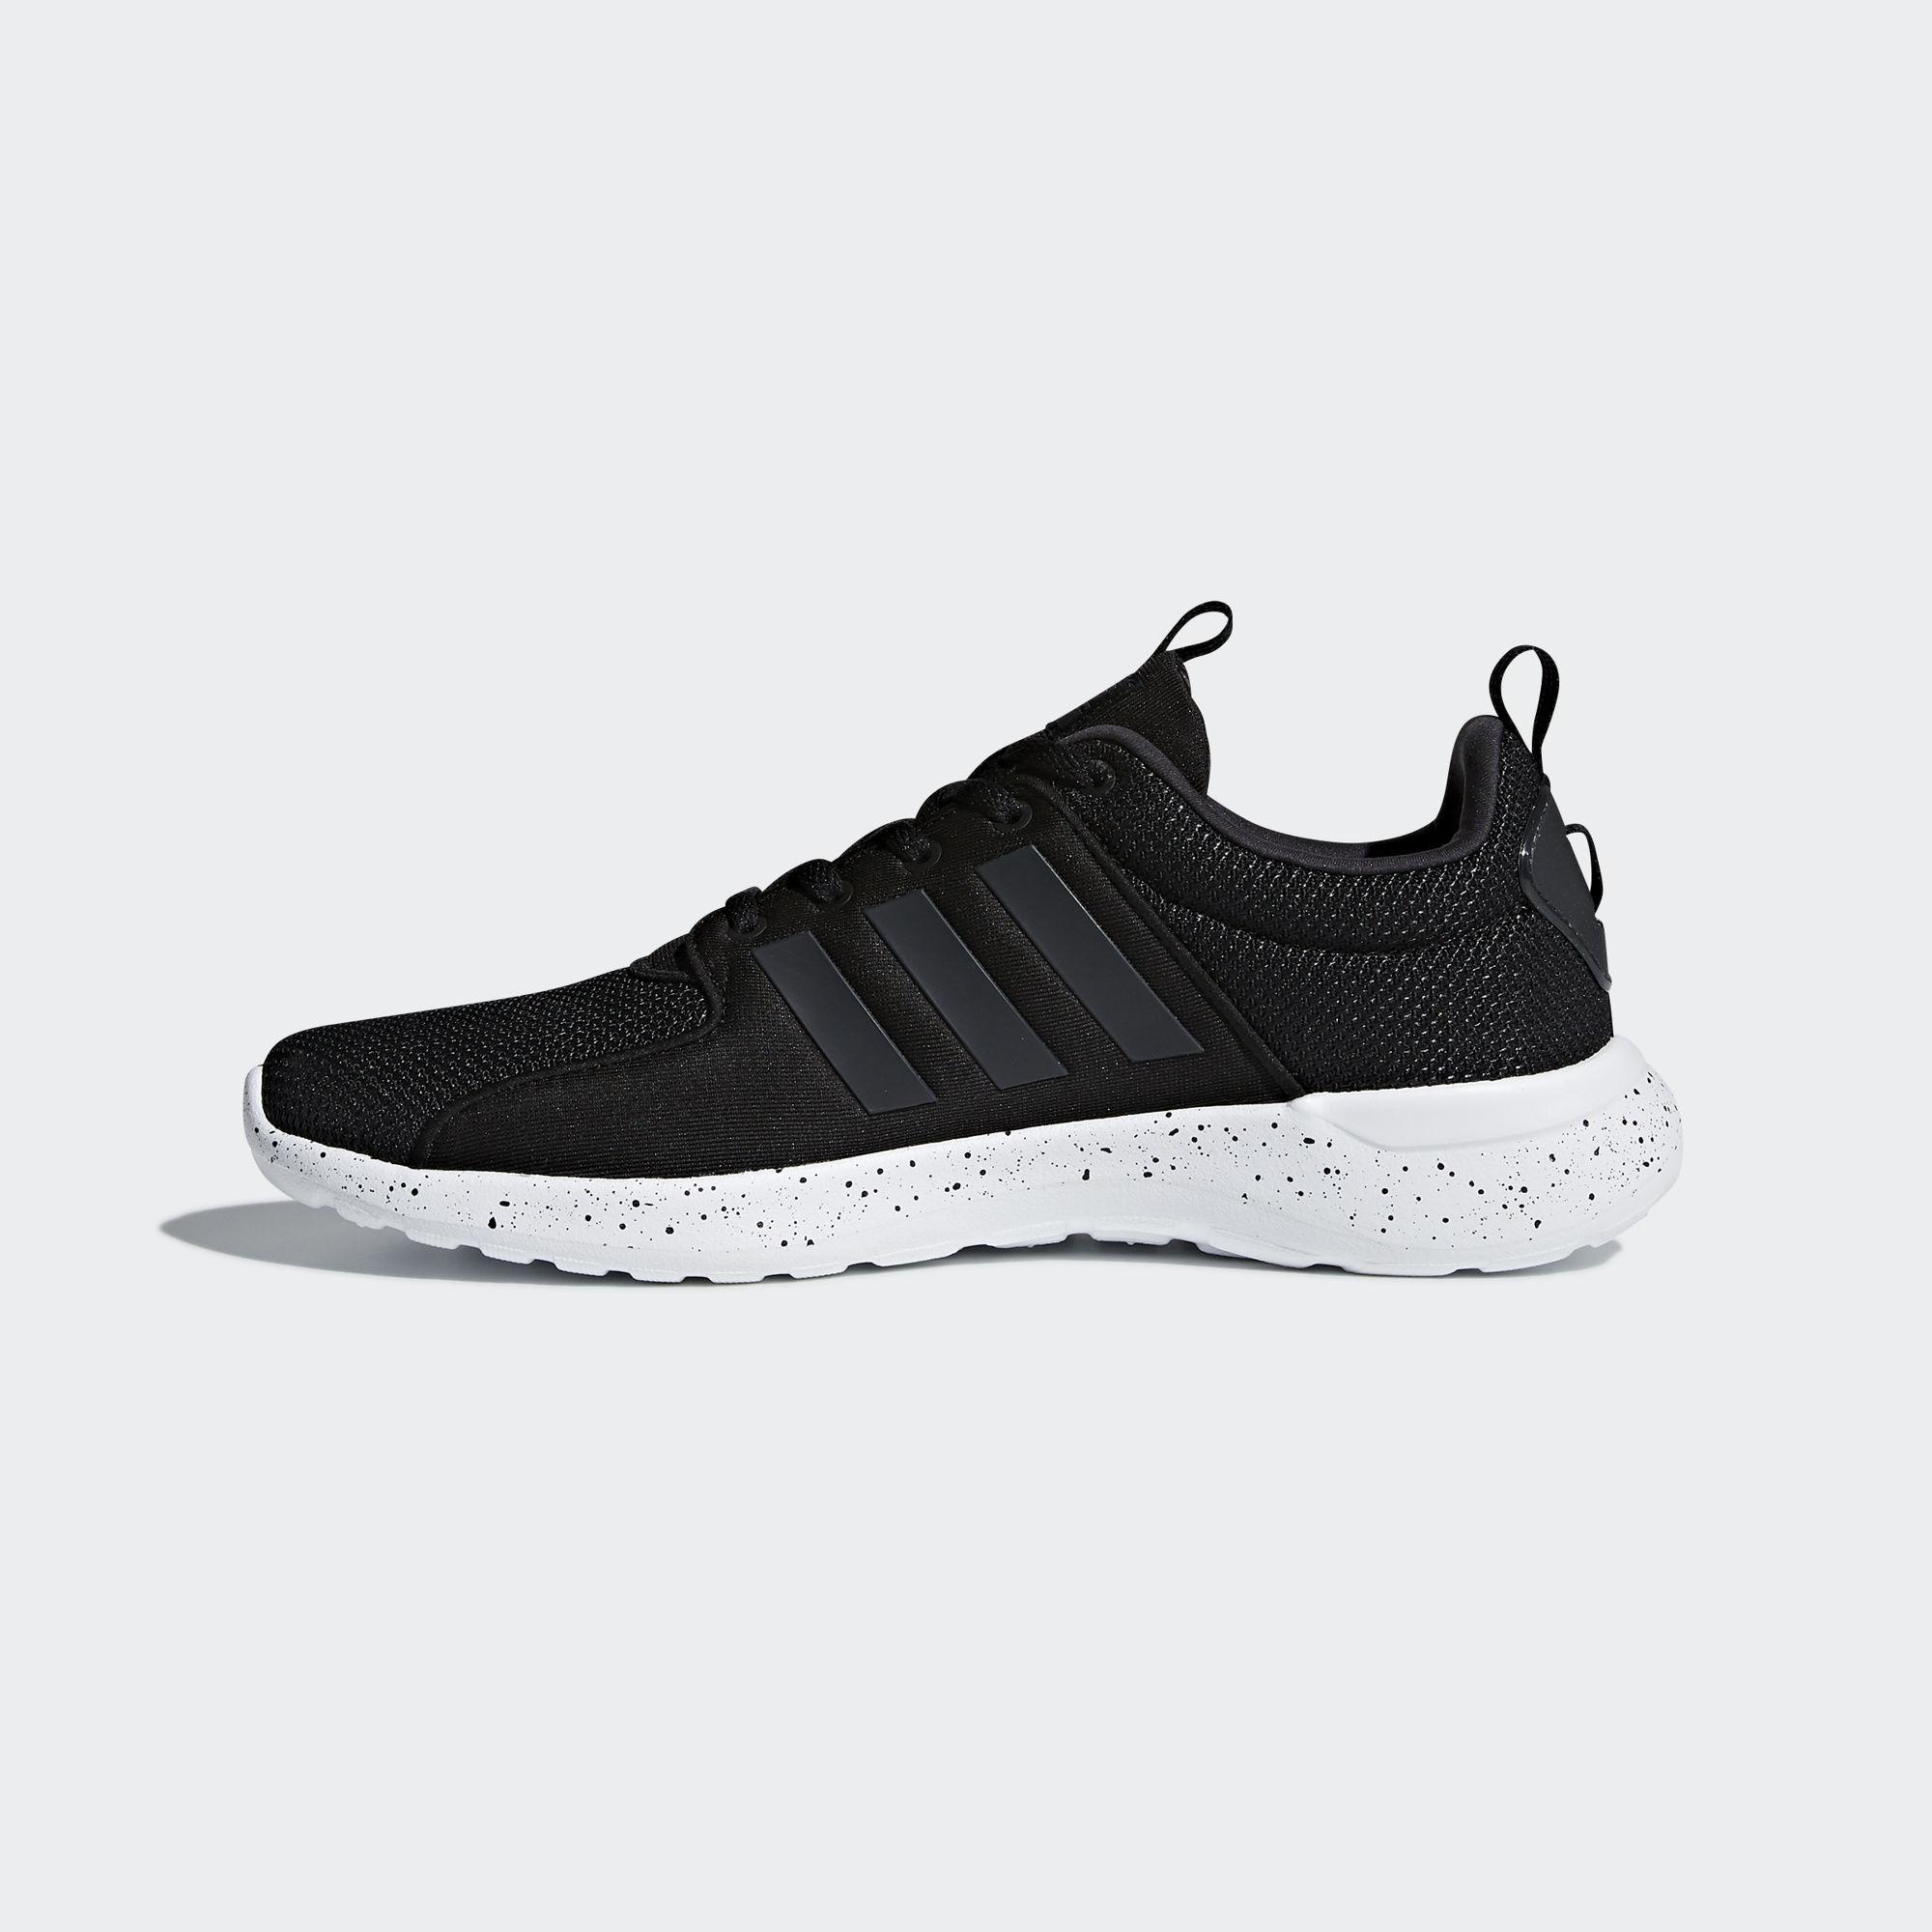 5 sur 8 DB0594 Adidas Scarpe Sneakers Running Sportive Ginnastica Tennis Cf  Lite racer 85eb5c91f8e65